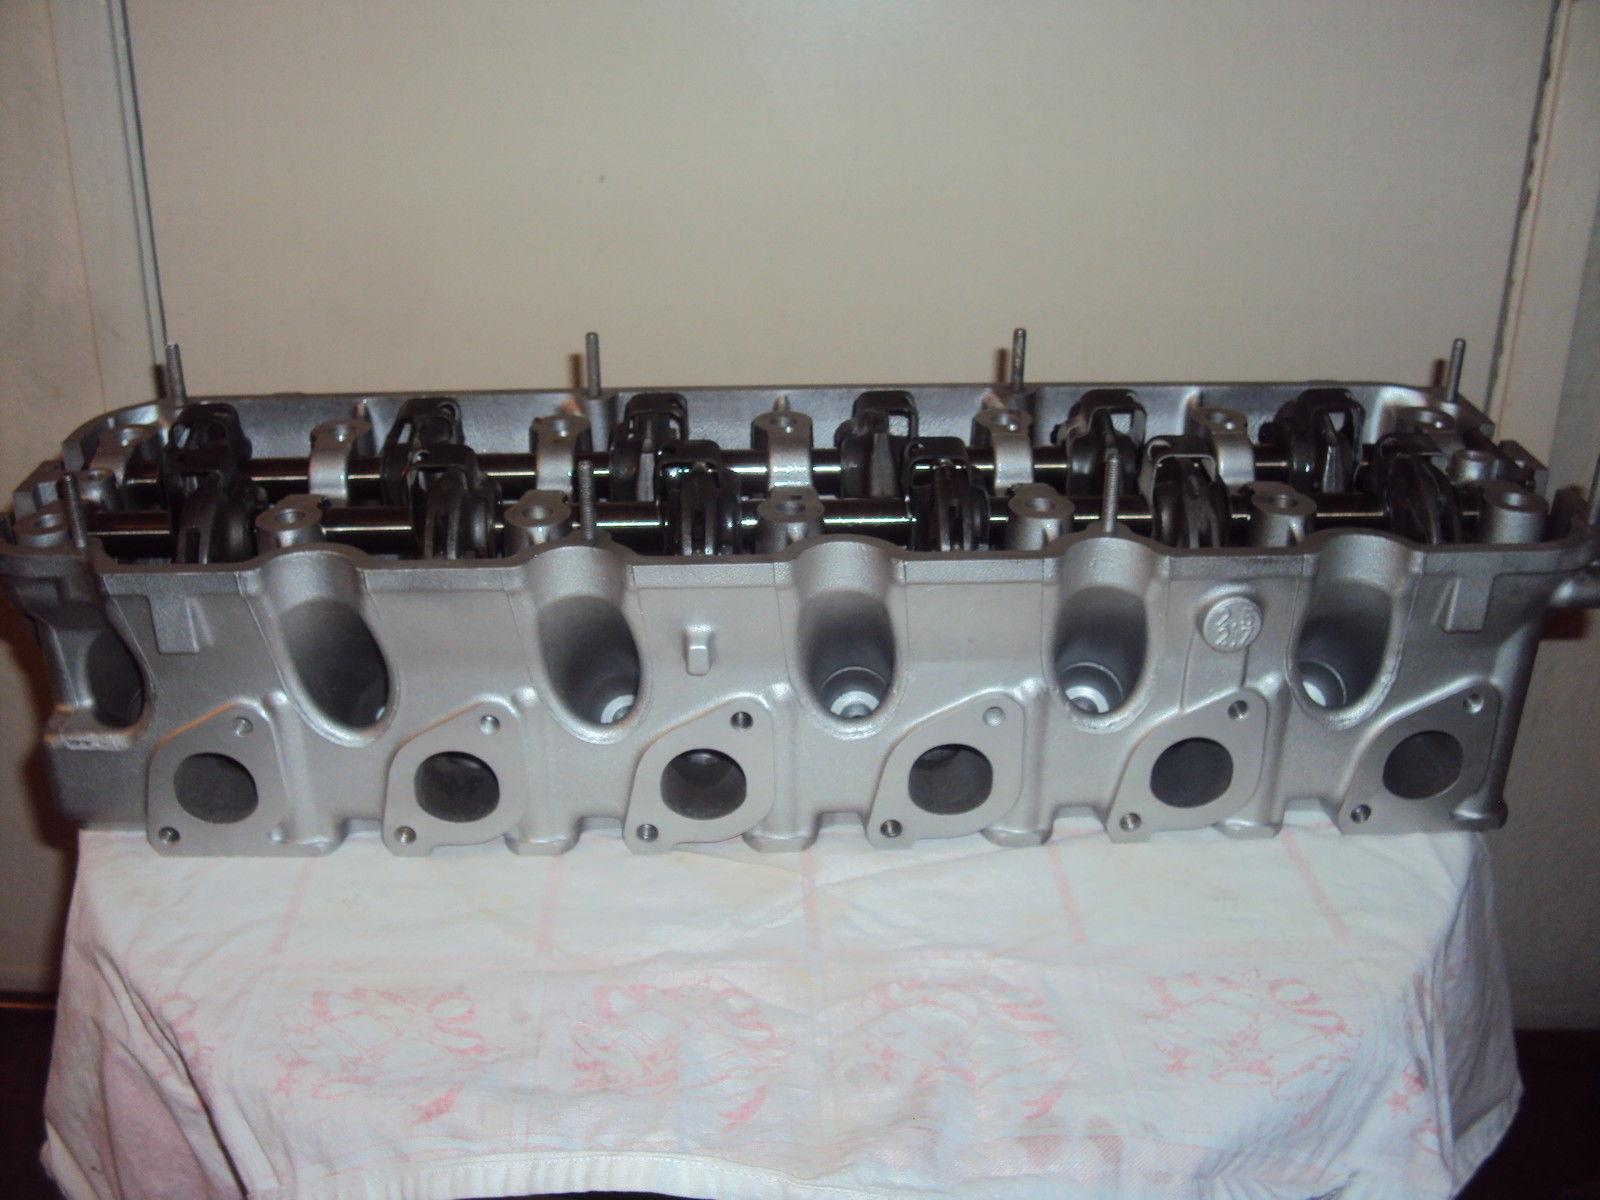 BMW 325i E30 E34 M20 Completely Rebuild 885 Cylinder Head